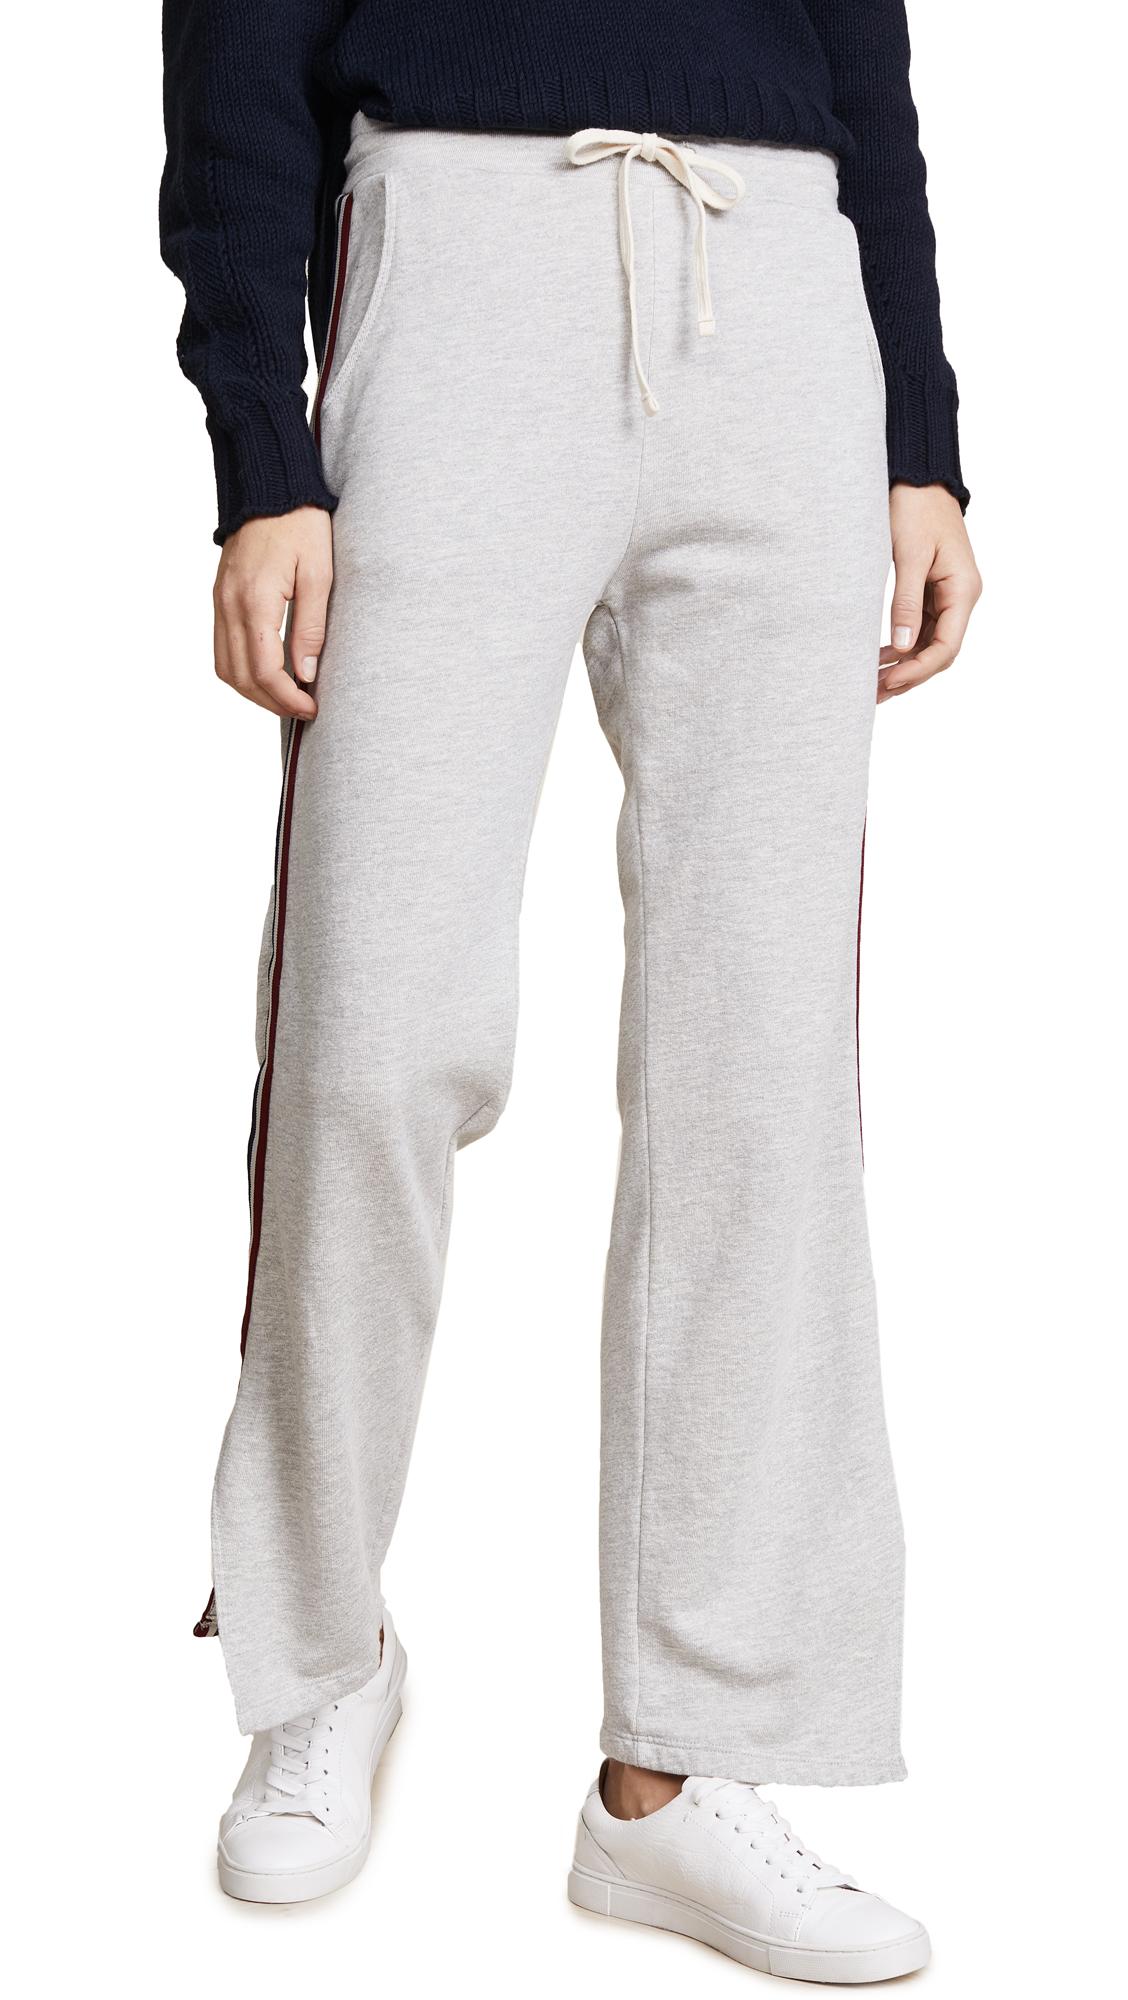 SUNDRY Track Pants with Stripe Trim